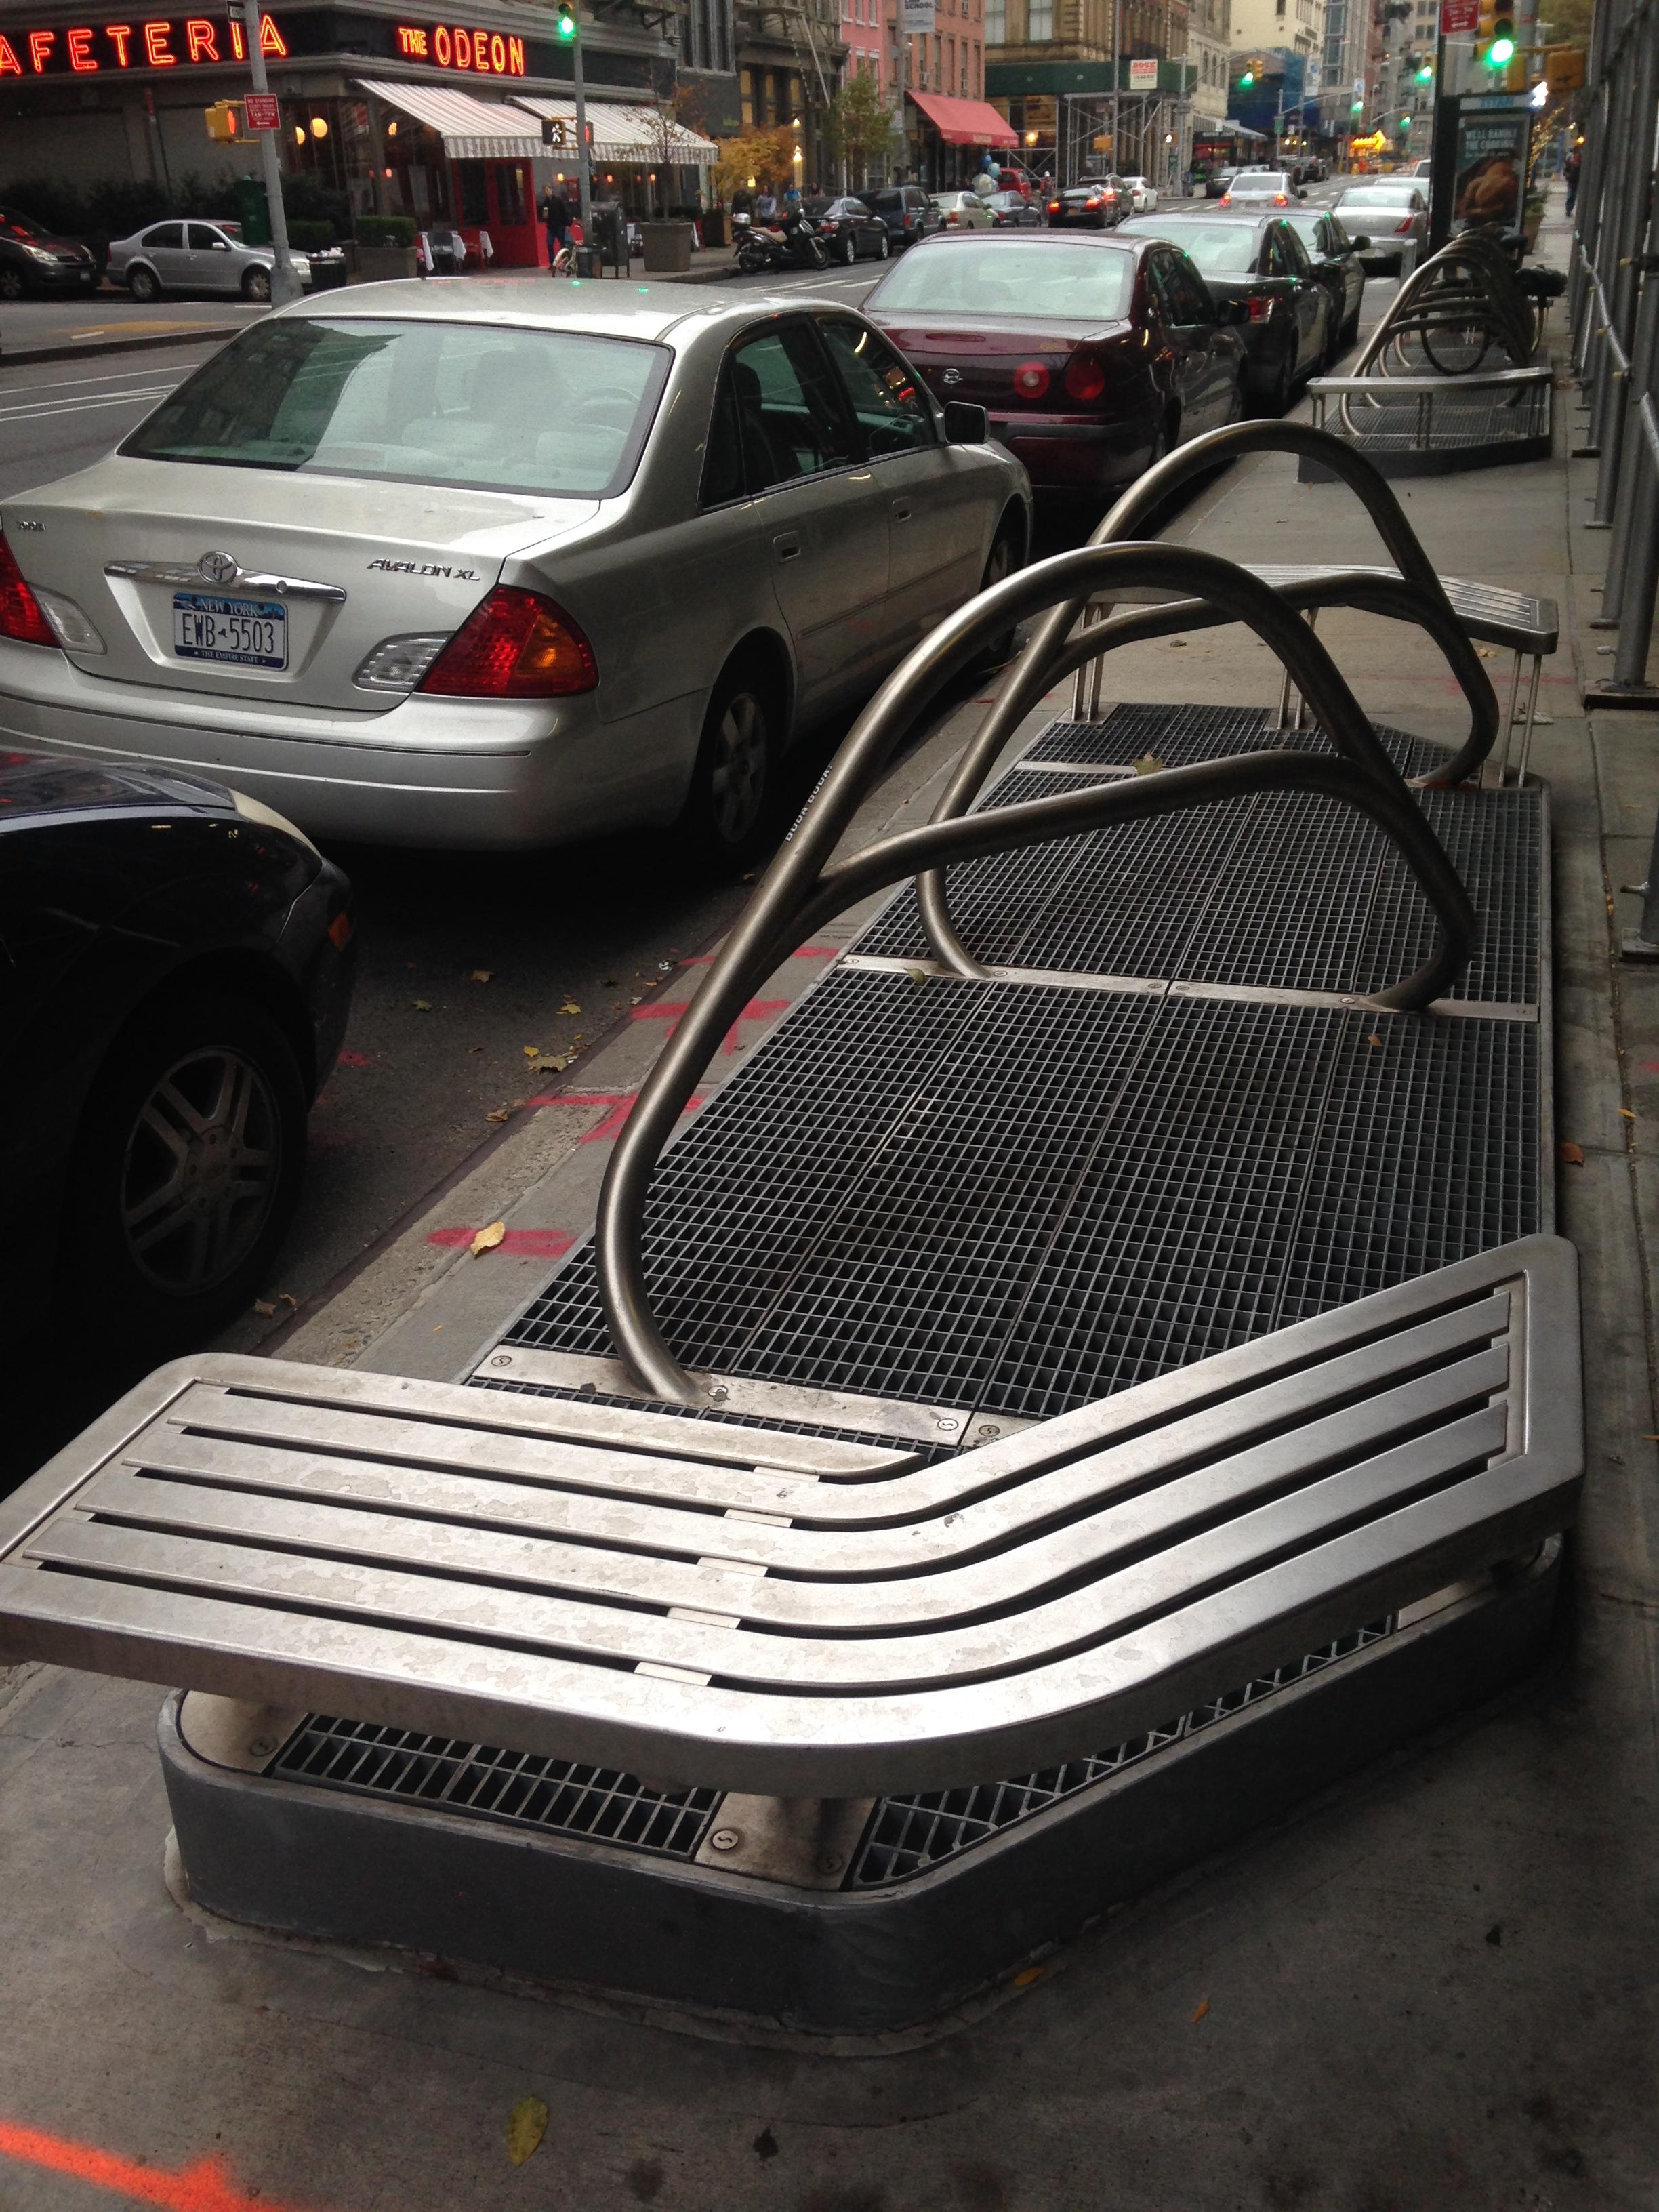 bench-and-bike-rack